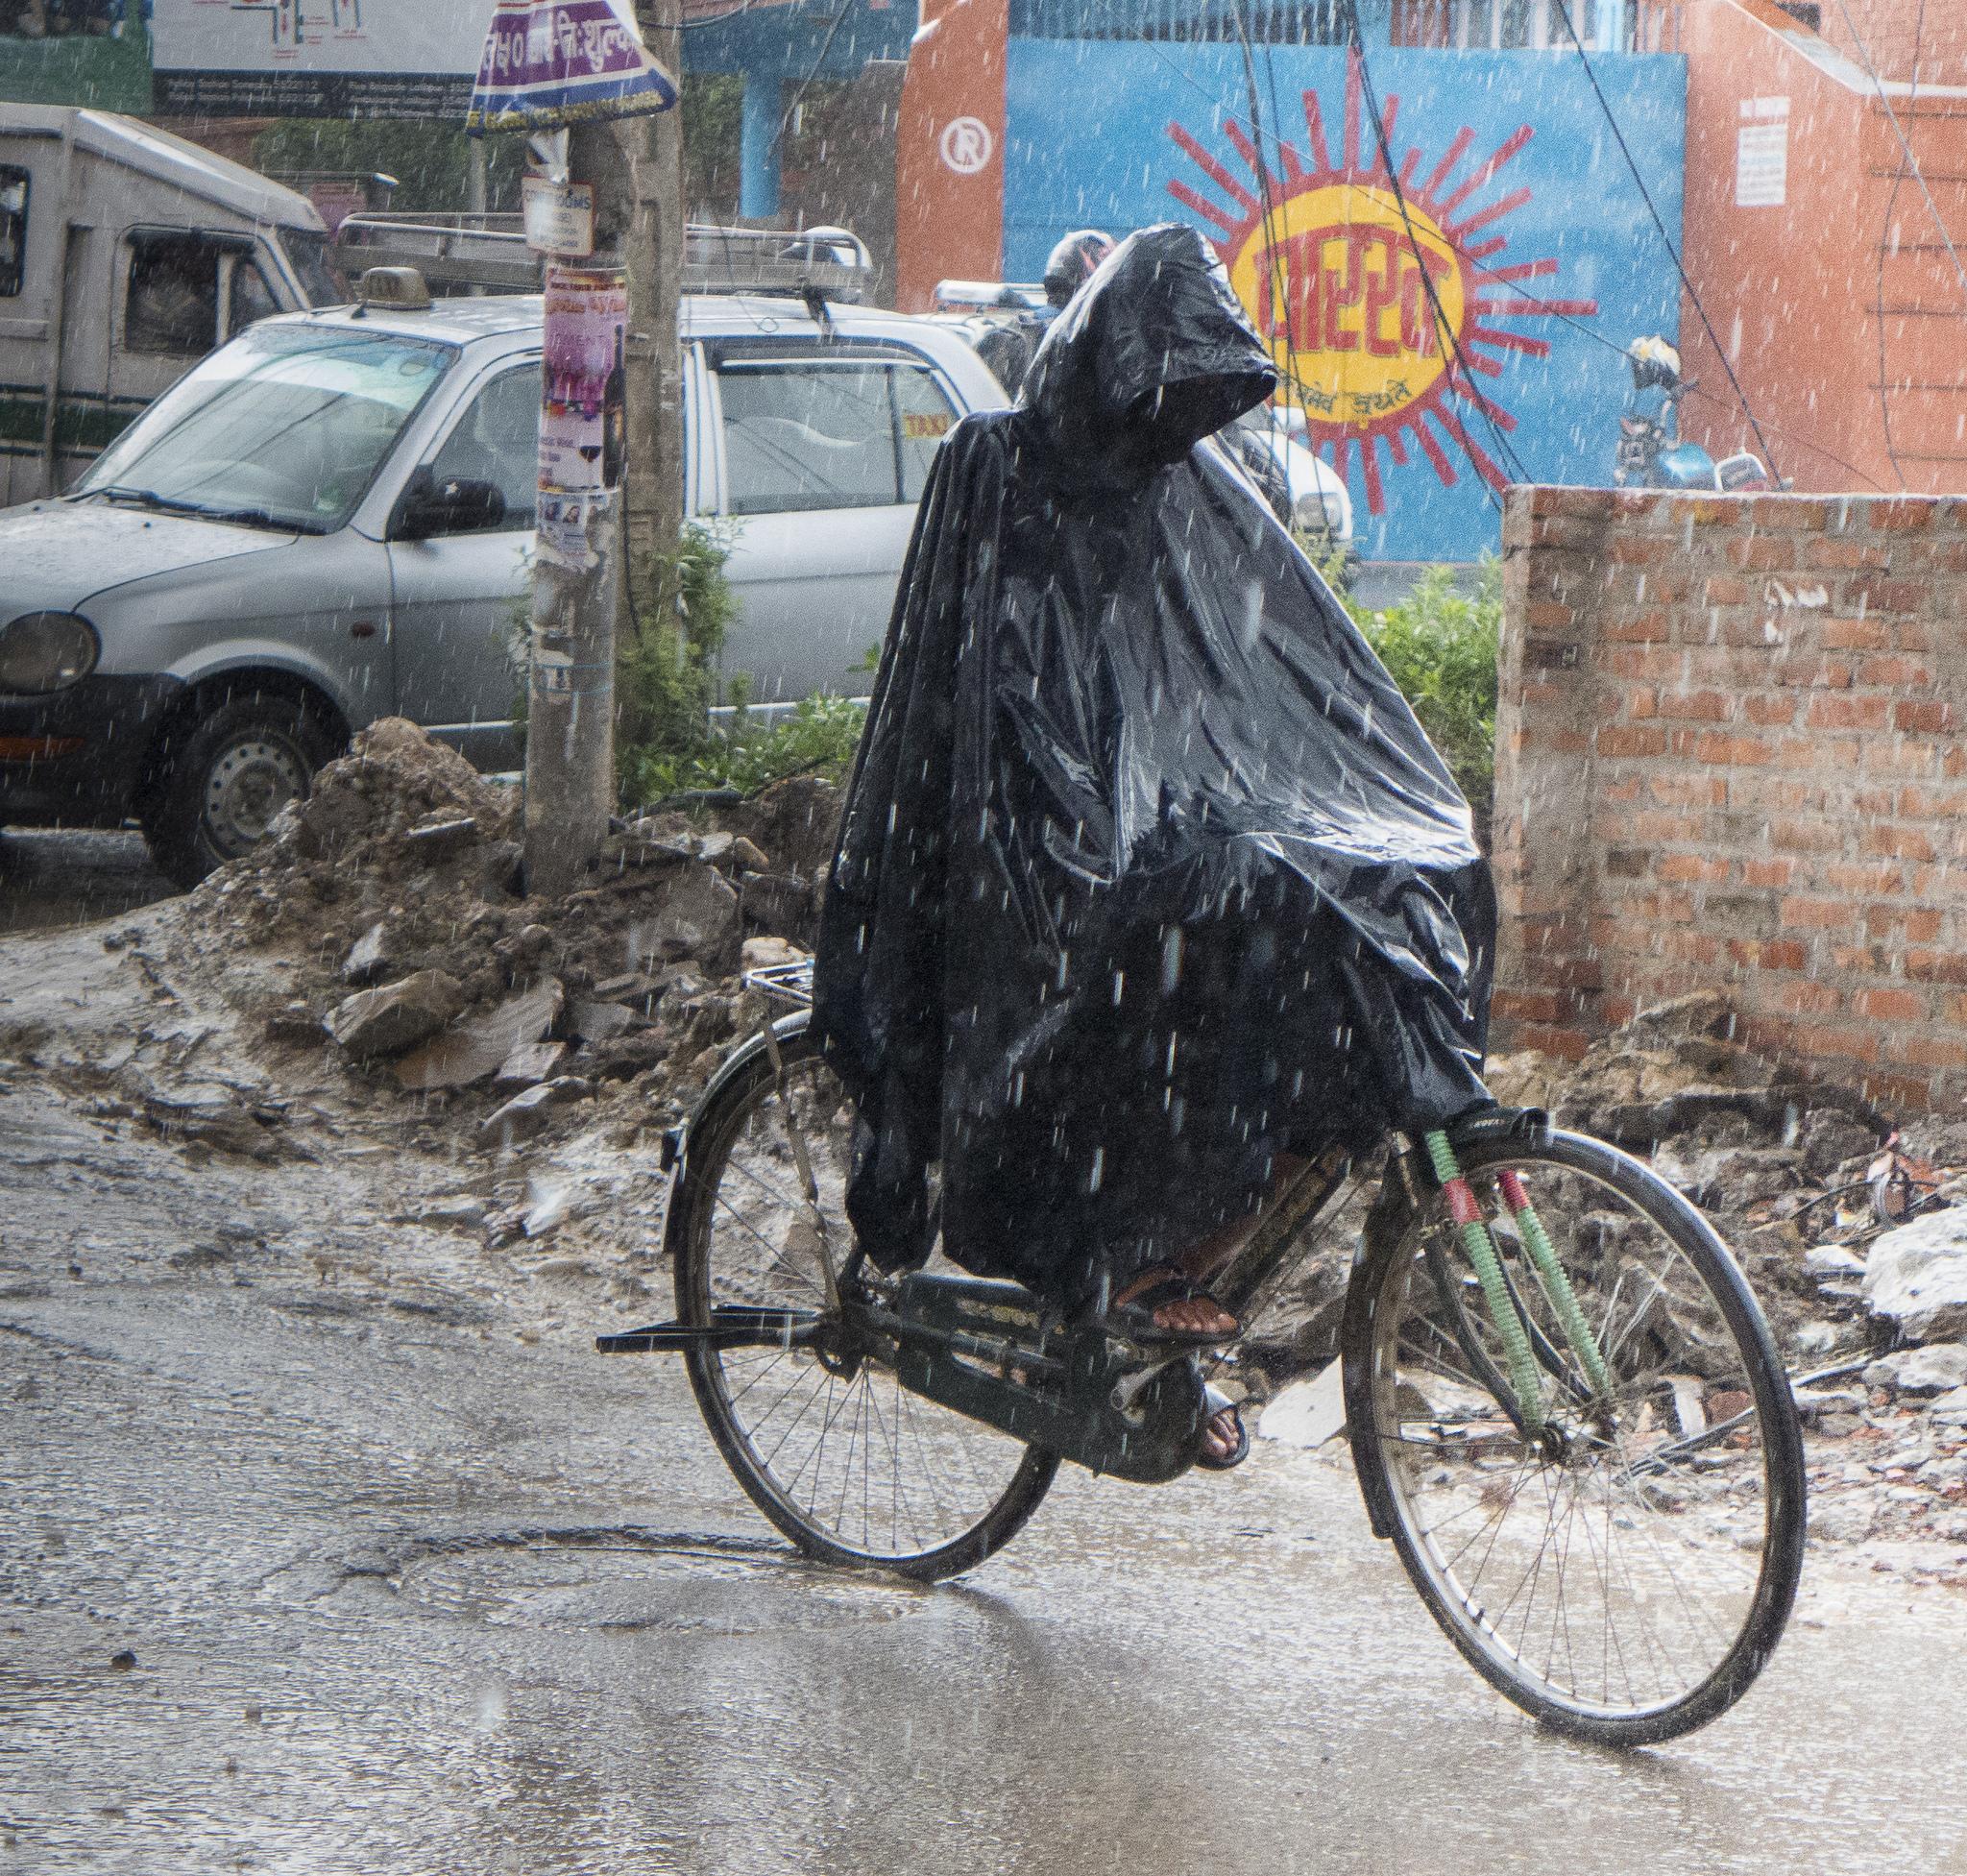 Monsoon season arrives, carrying new threat